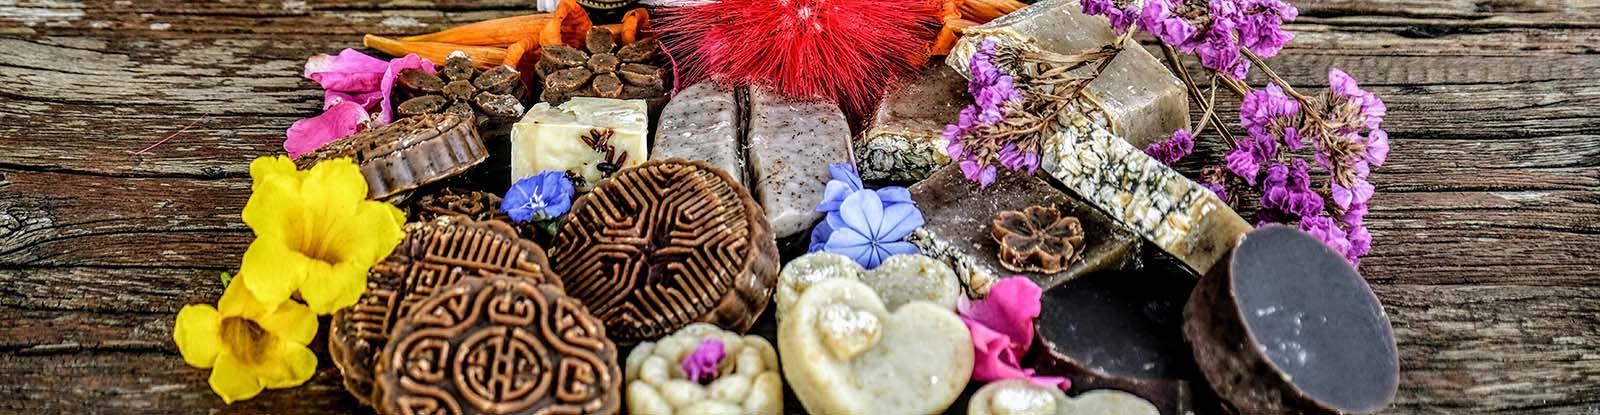 hand-made-choclate-oats-vegan-organic-soap-skin-care-work-shop-she-divine (2).jpg